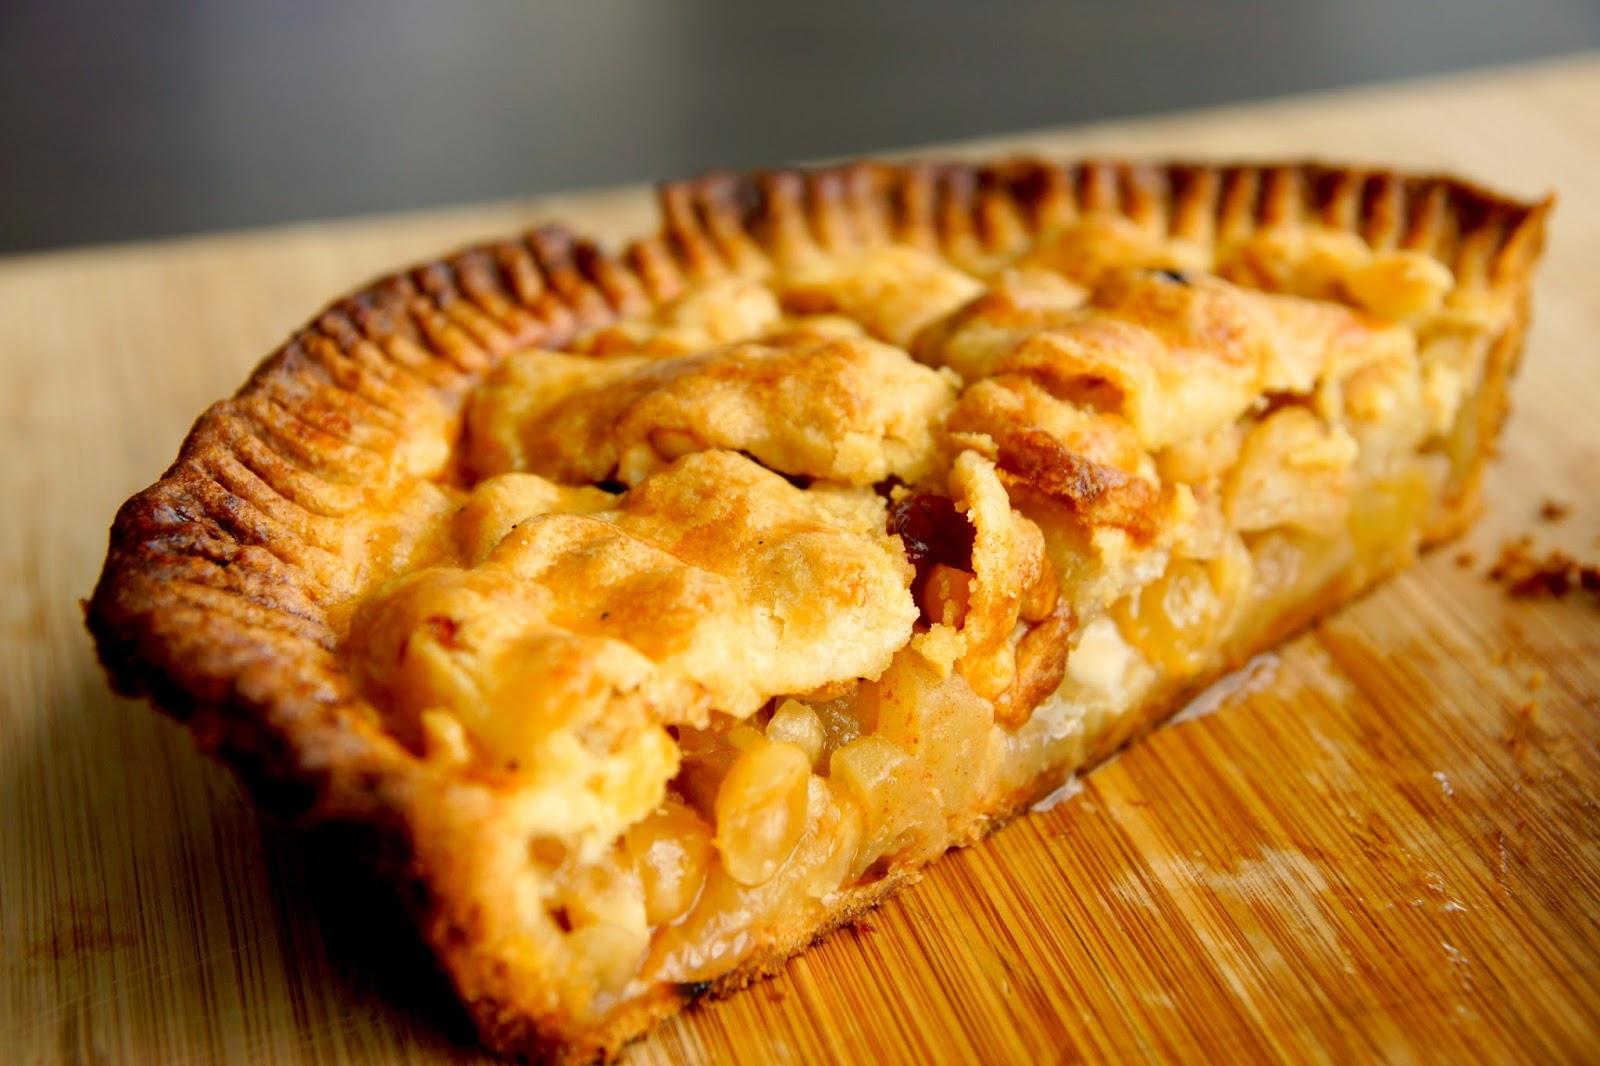 Apple pie recipe video ricpe cast iron pan